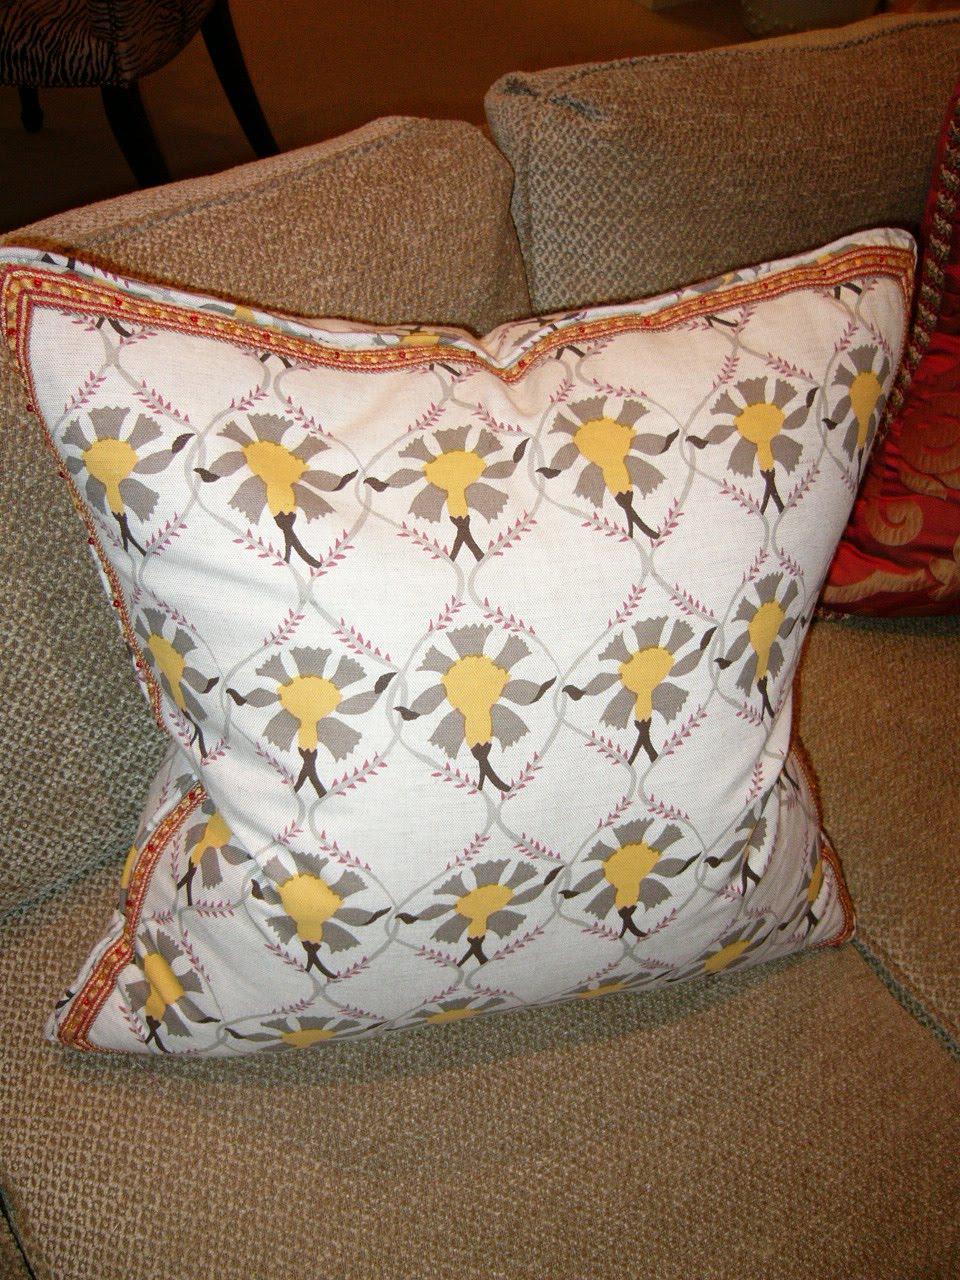 Design 101 decorative accent pillows the designer insider for Insider design pillow